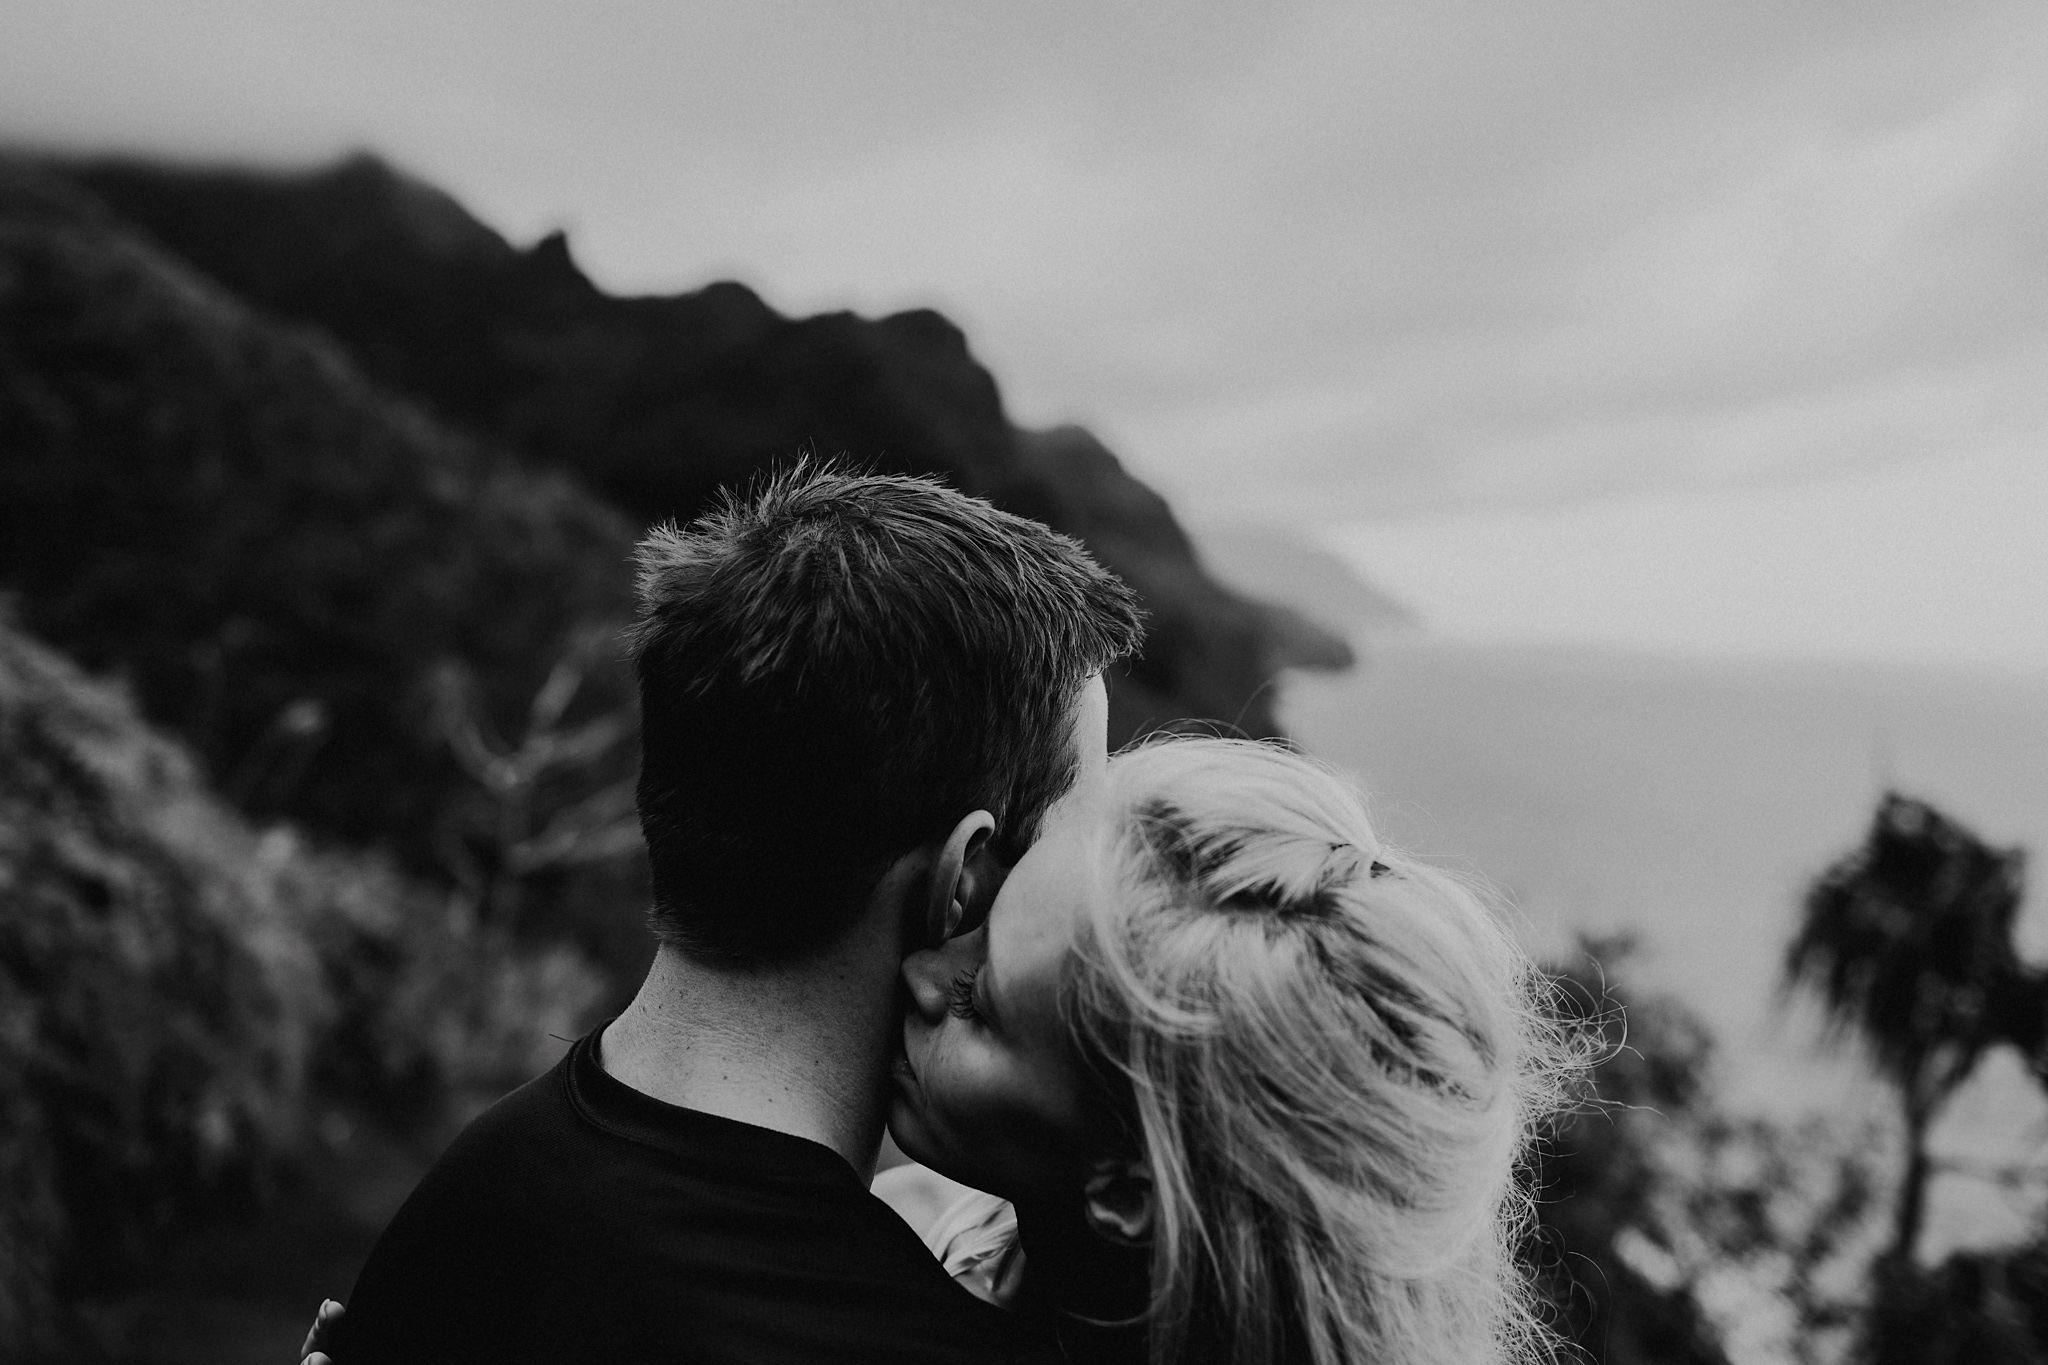 hawaii kauai elopement na pali coast mountain hike bride groom hugging photo